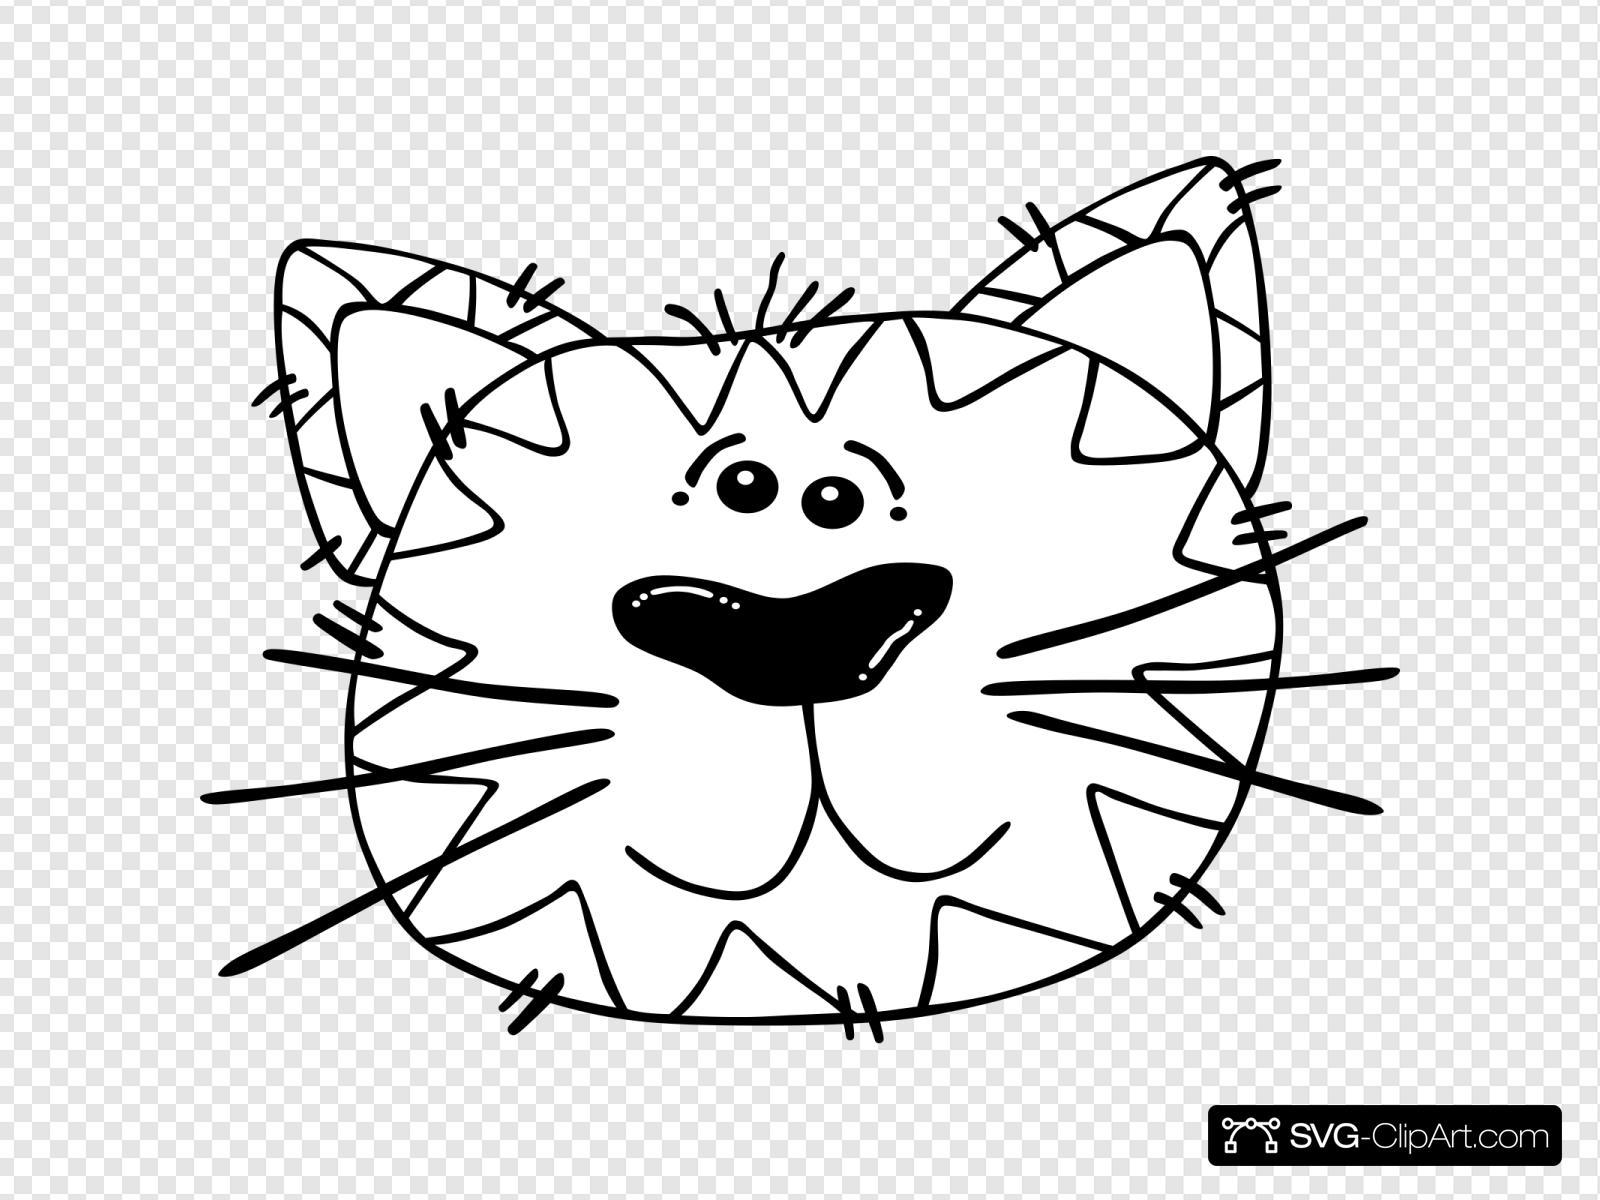 Cartoon Cat Face Outline Svg Vector Cartoon Cat Face Outline Clip Art Svg Clipart